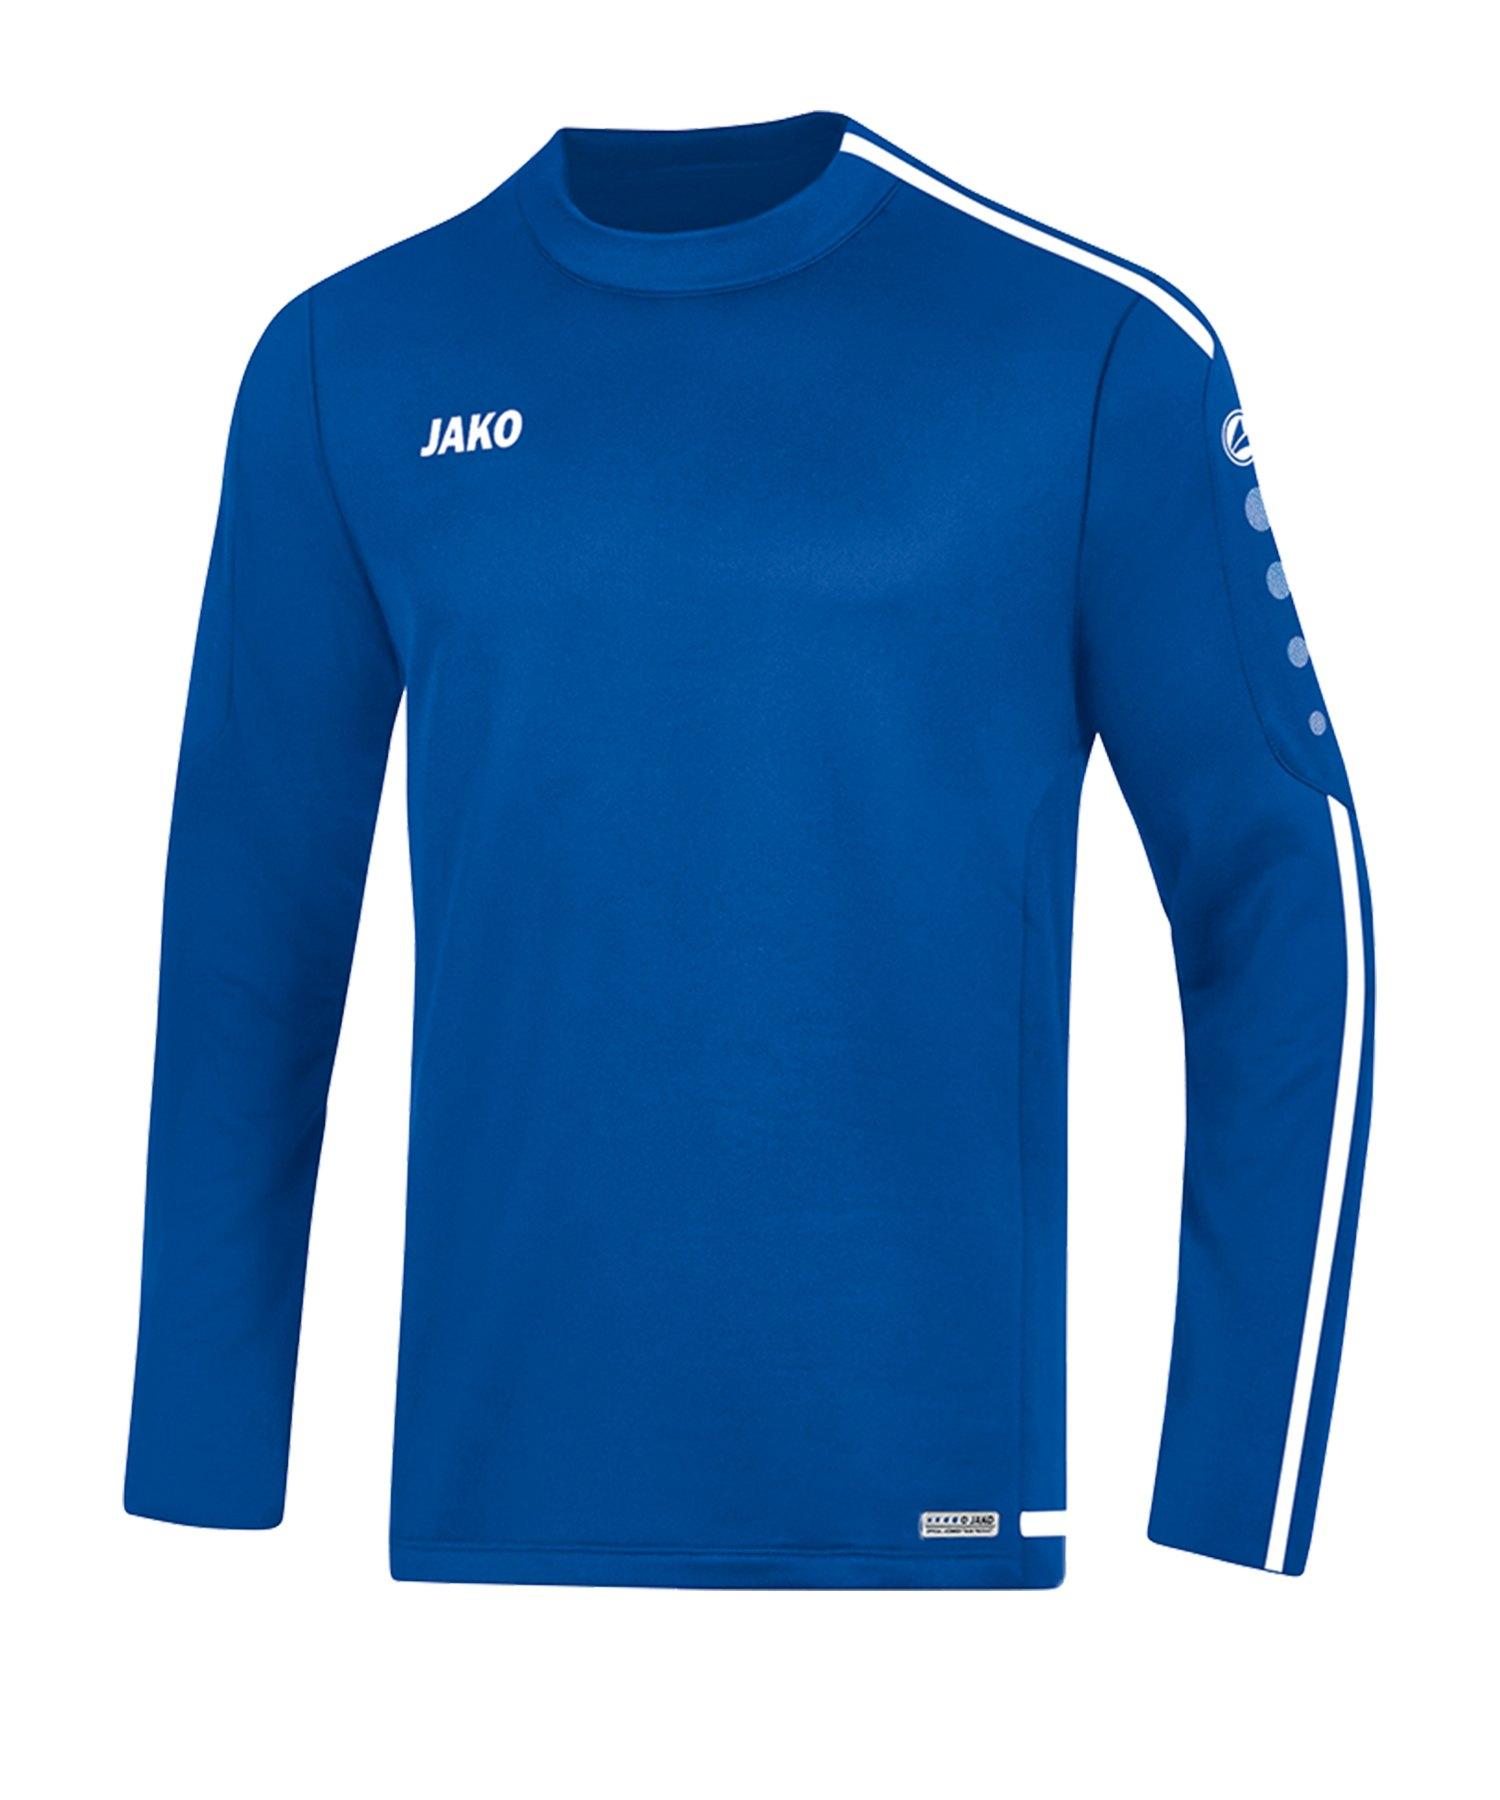 Jako Striker 2.0 Sweatshirt Blau Weiss F04 - Blau